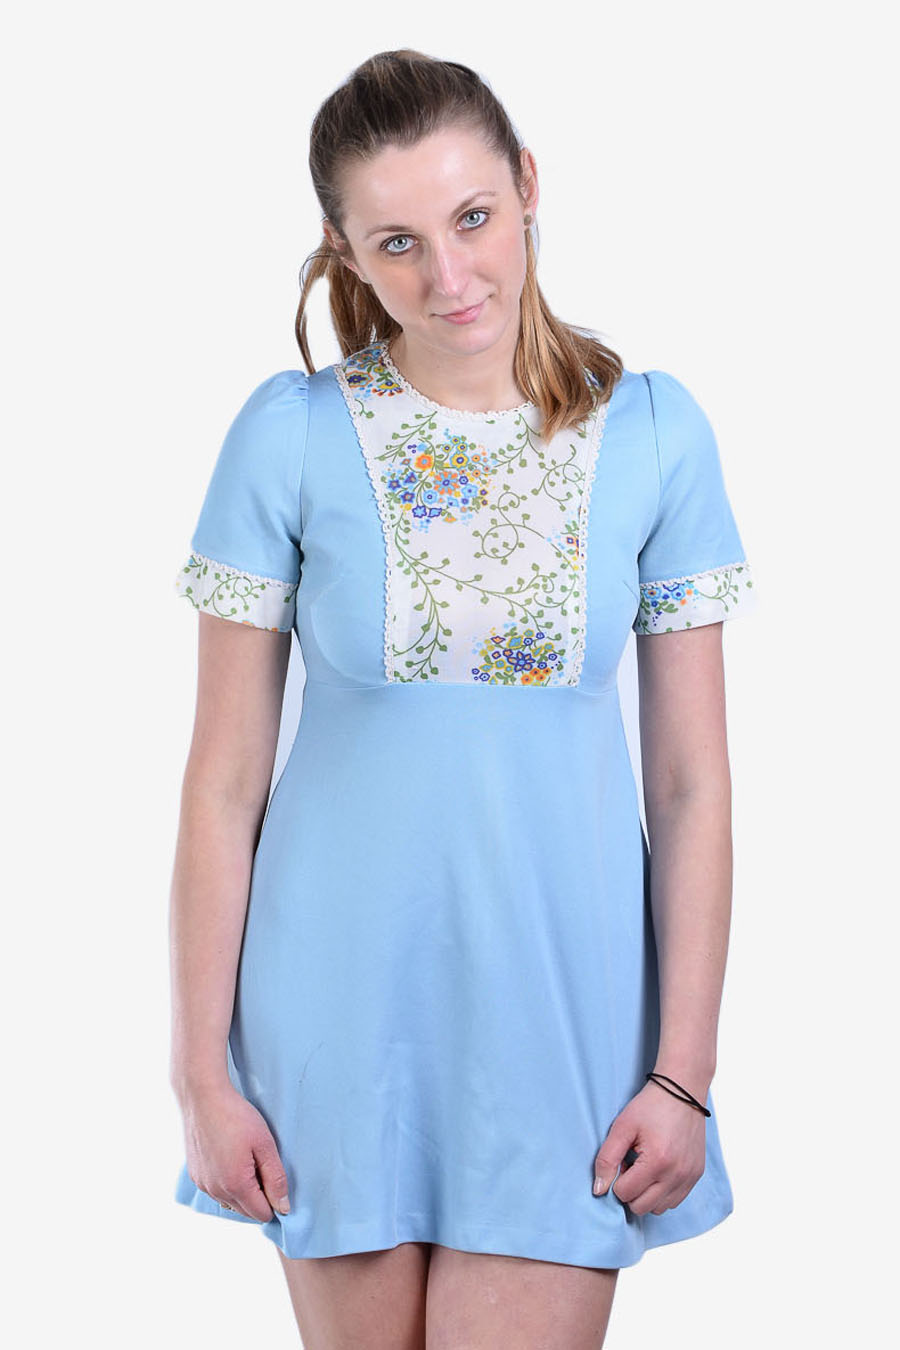 Vintage 1970's babydoll mini dress